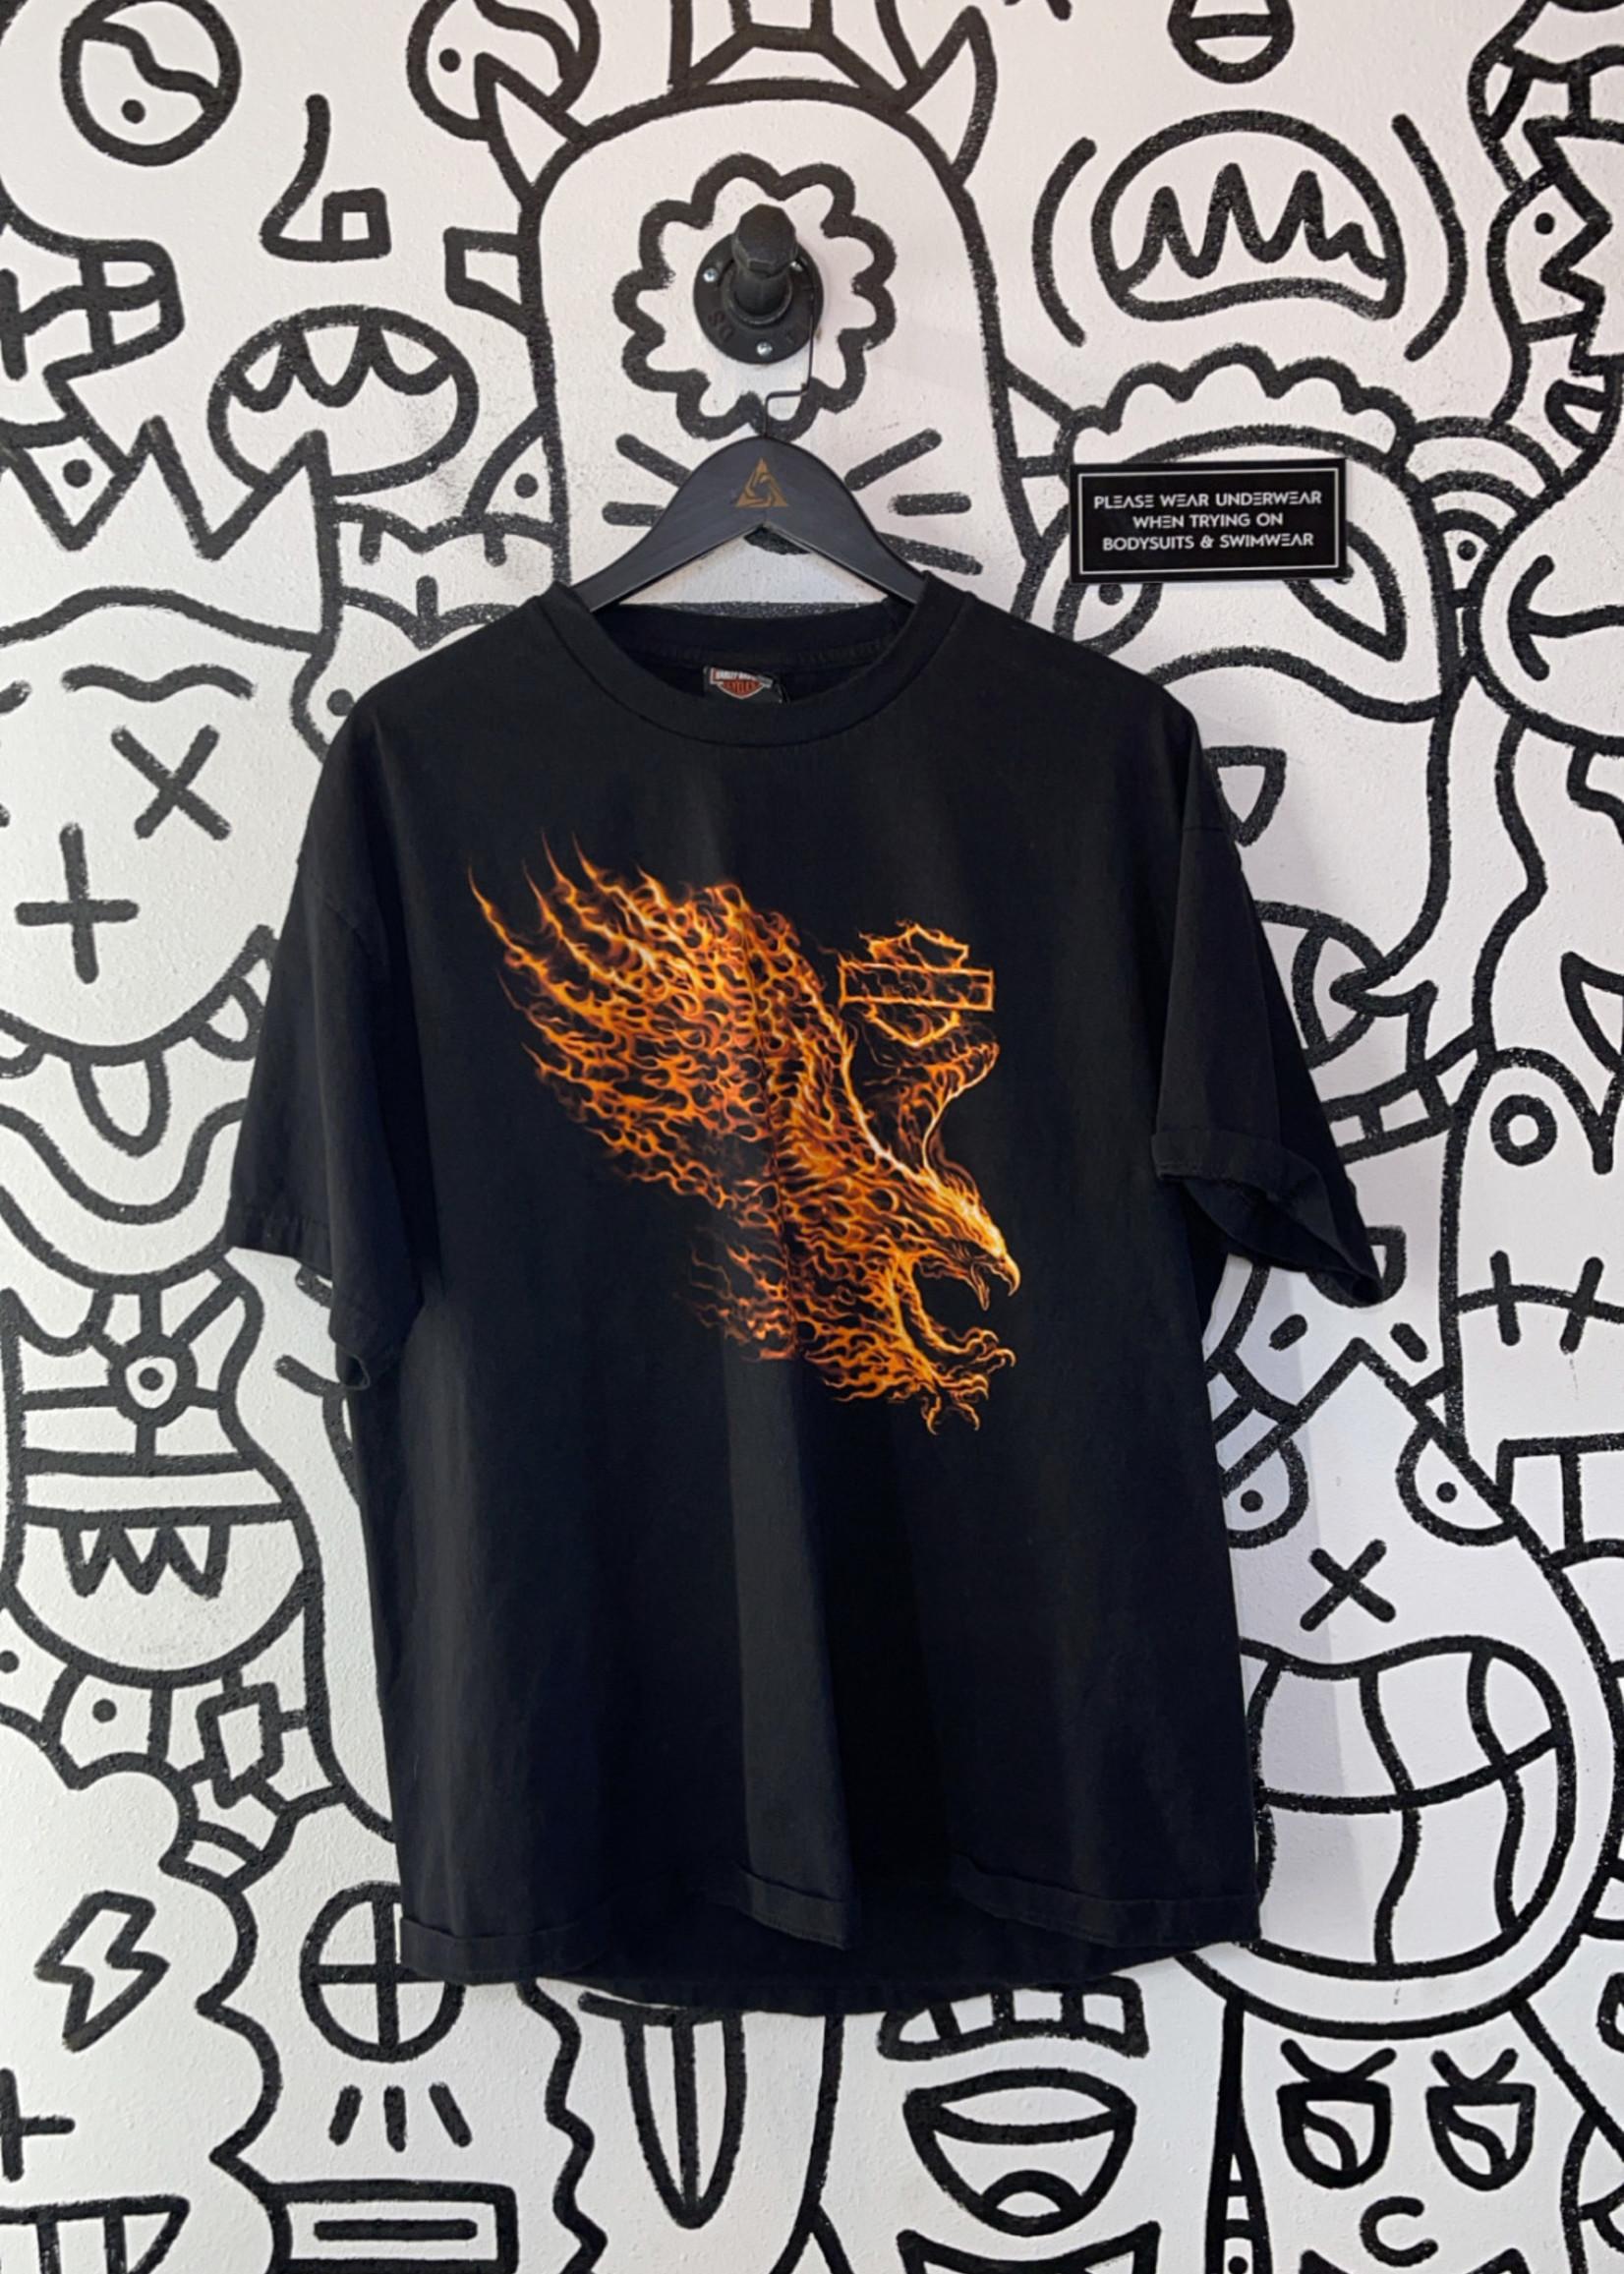 Harley Davidson Flame Eagle Black Tee XL